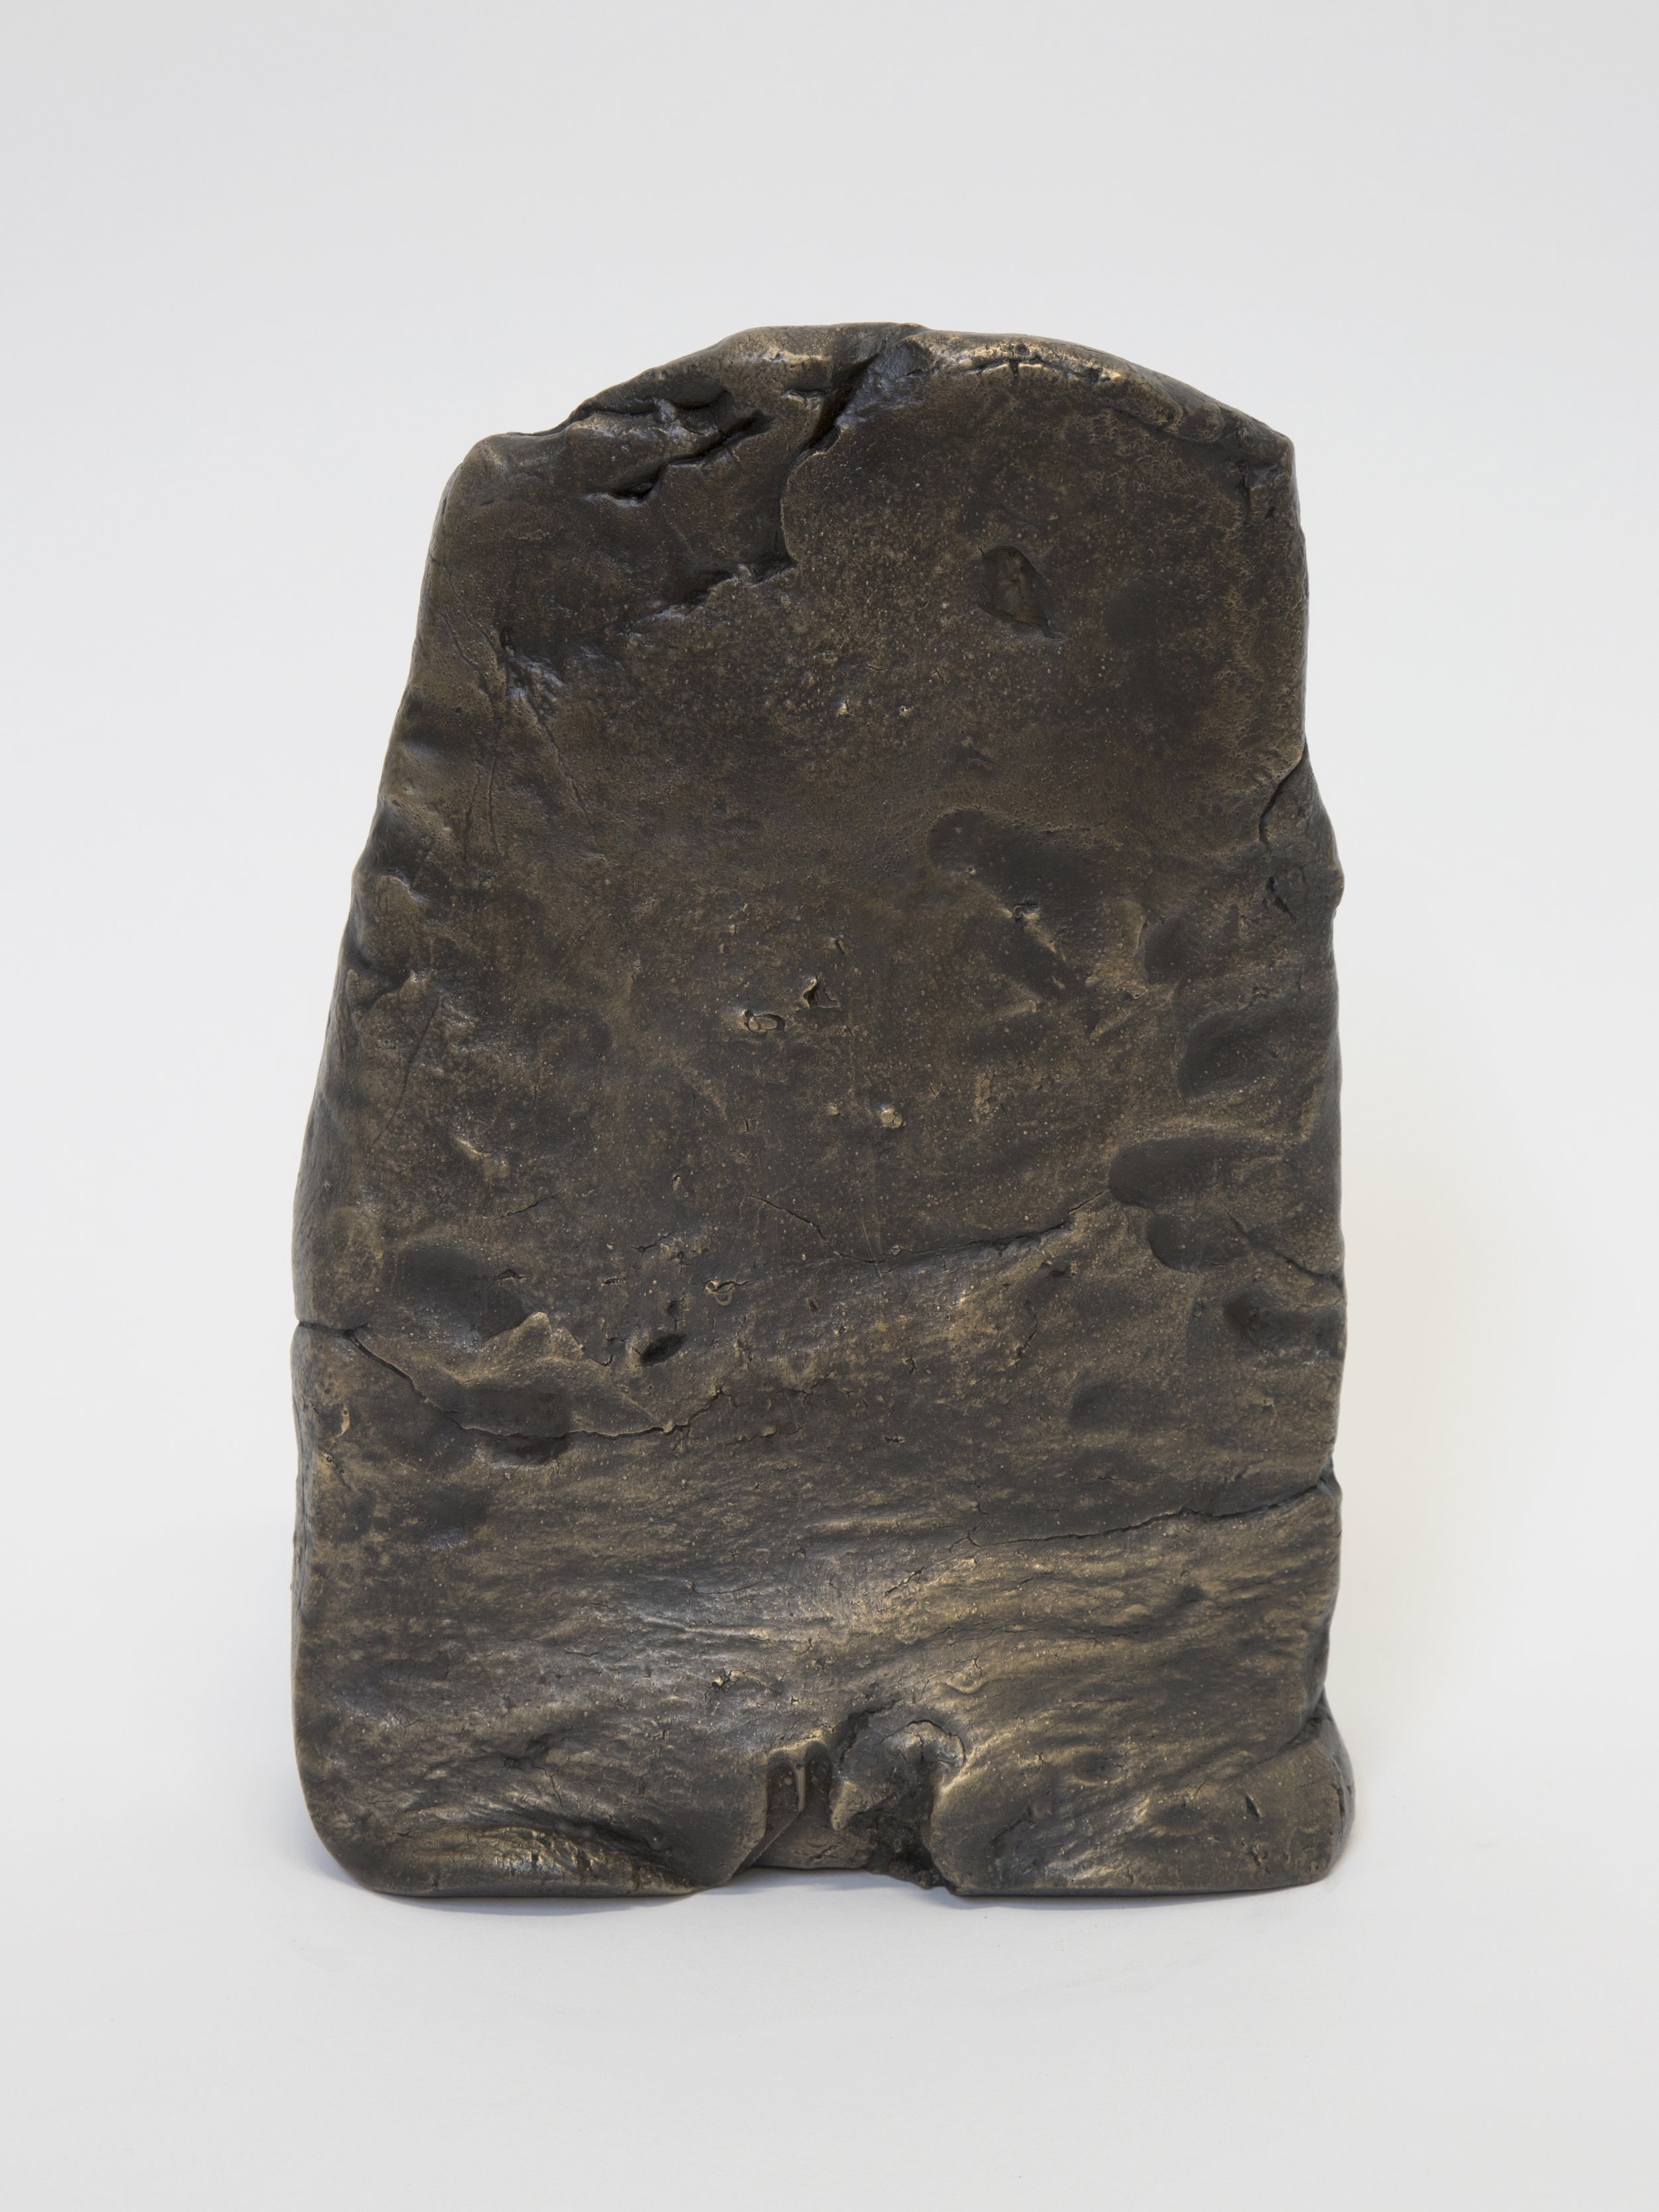 Sebastian Gladstone   Untitled Bronze , 2018 (alternate view)